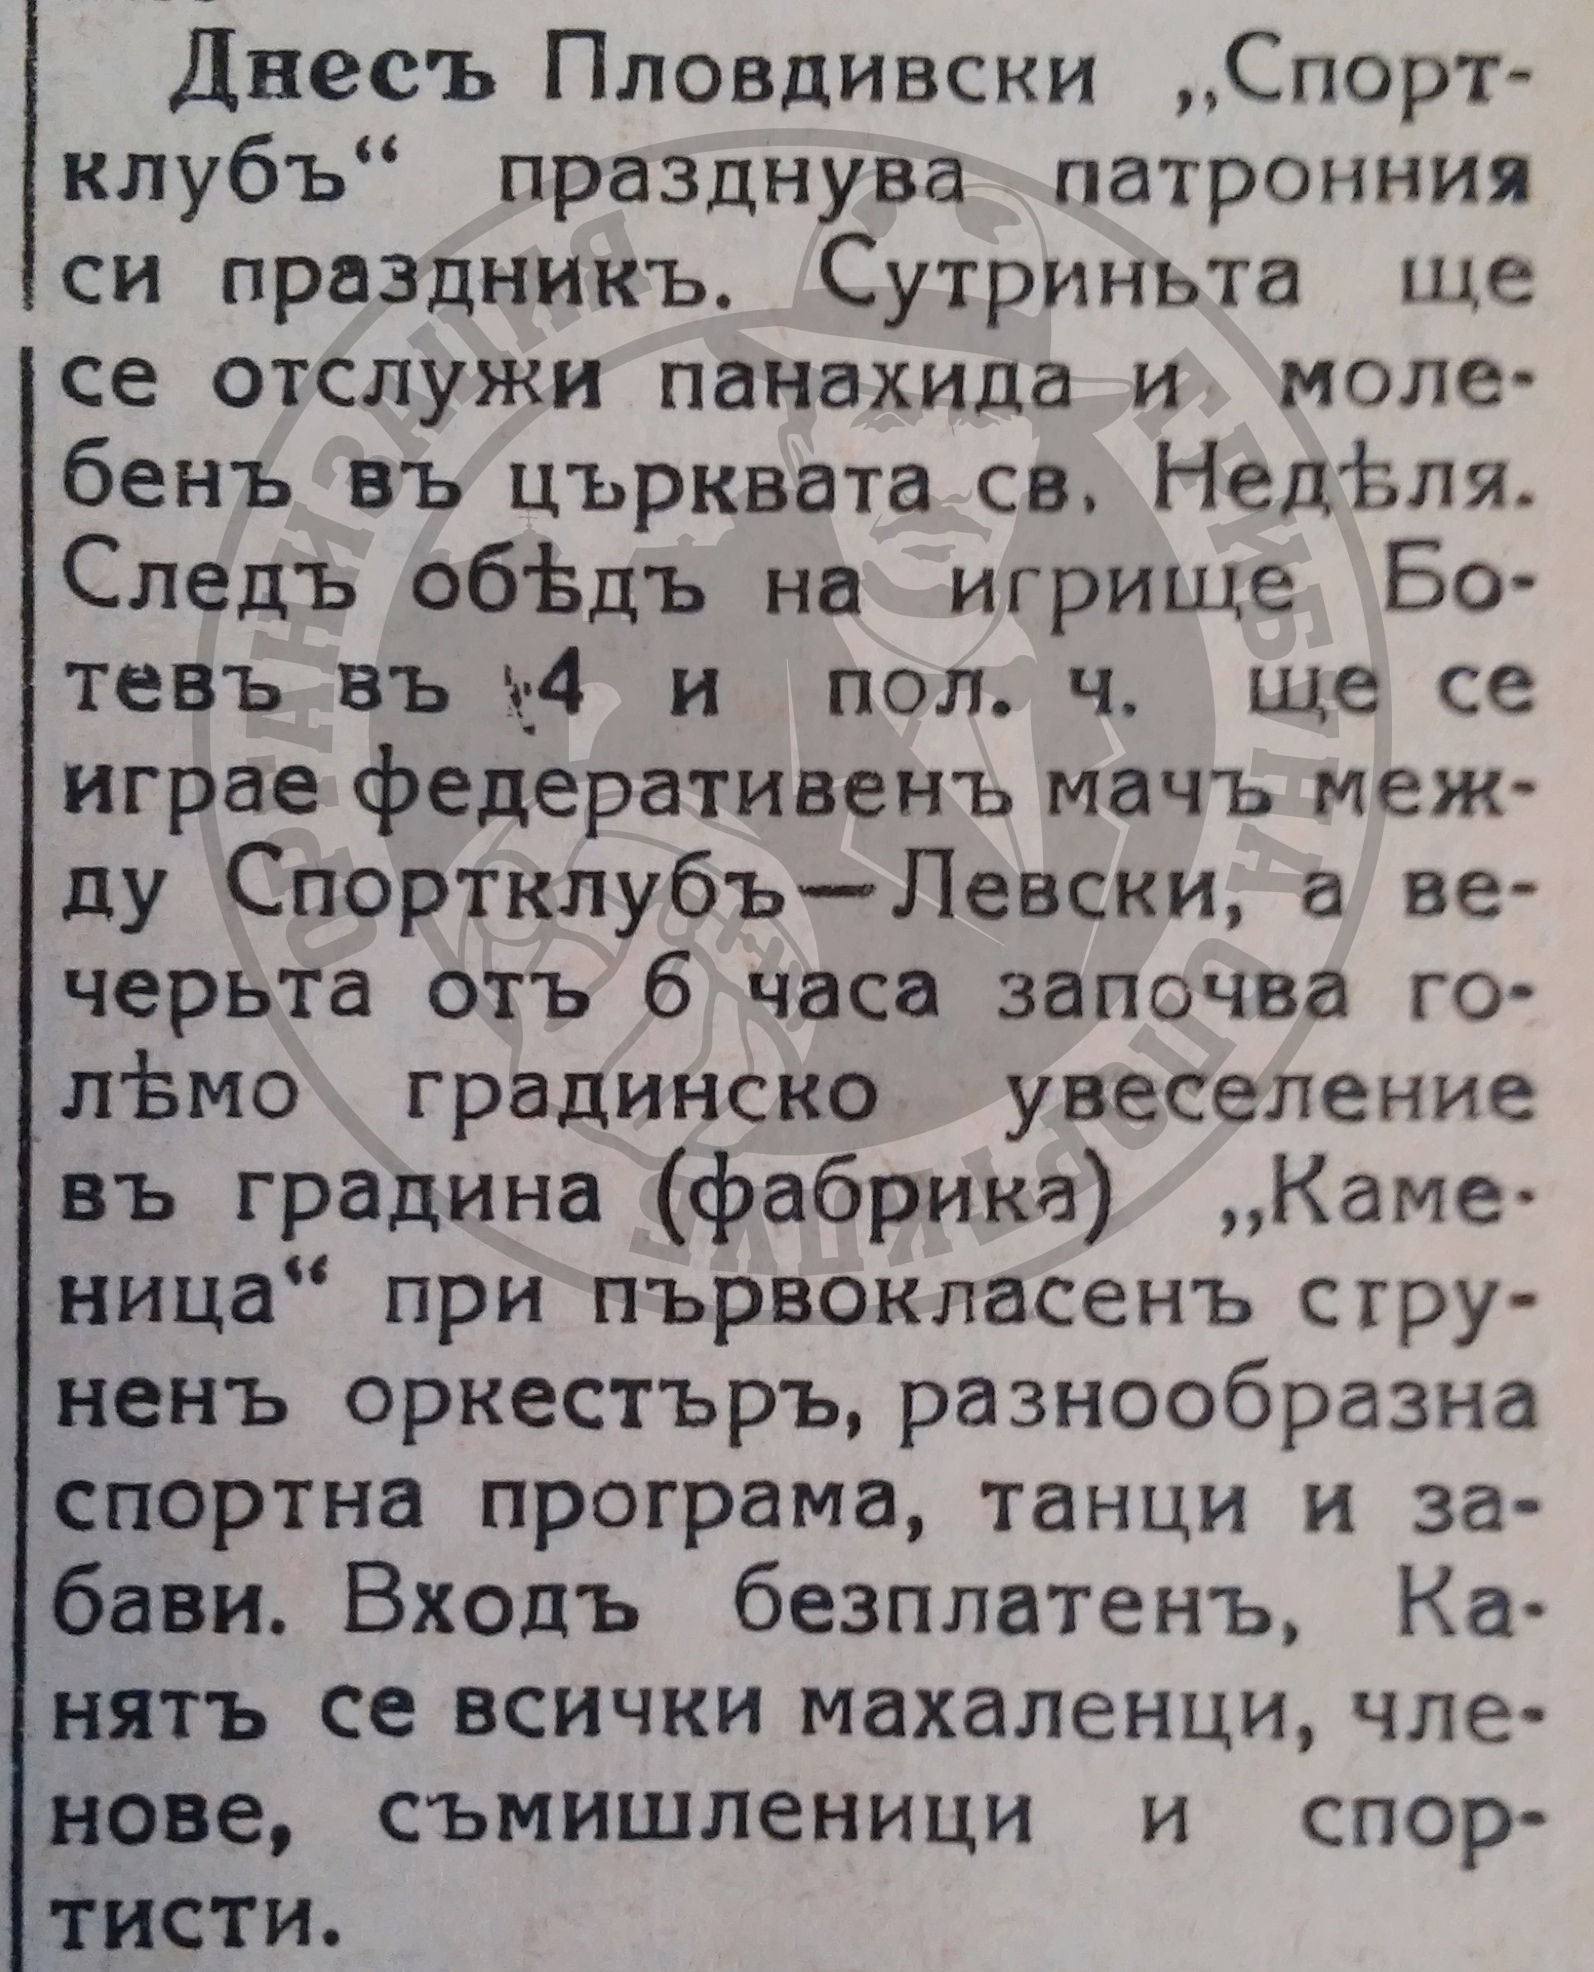 Втора част – 1935 година